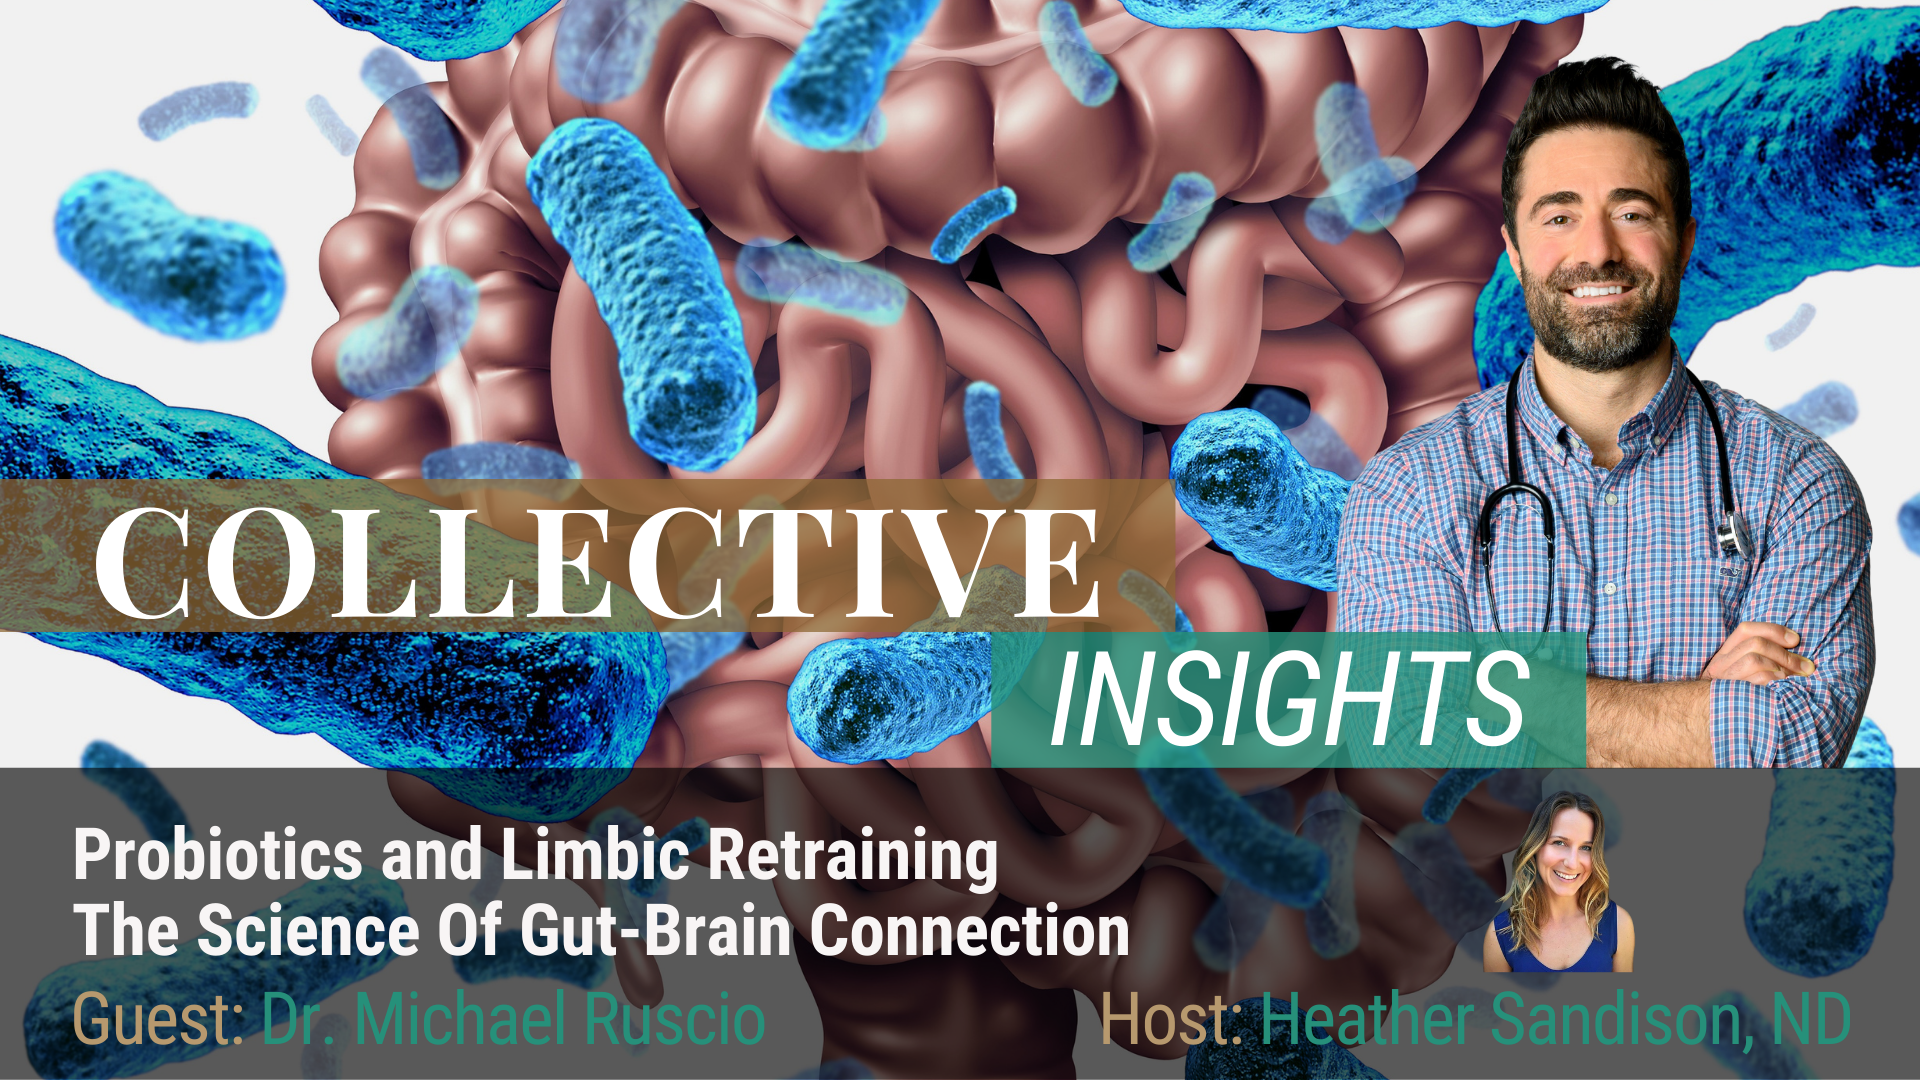 The Science of Gut-brain & Probiotics - Dr. Michael Ruscio - Gut-Brain